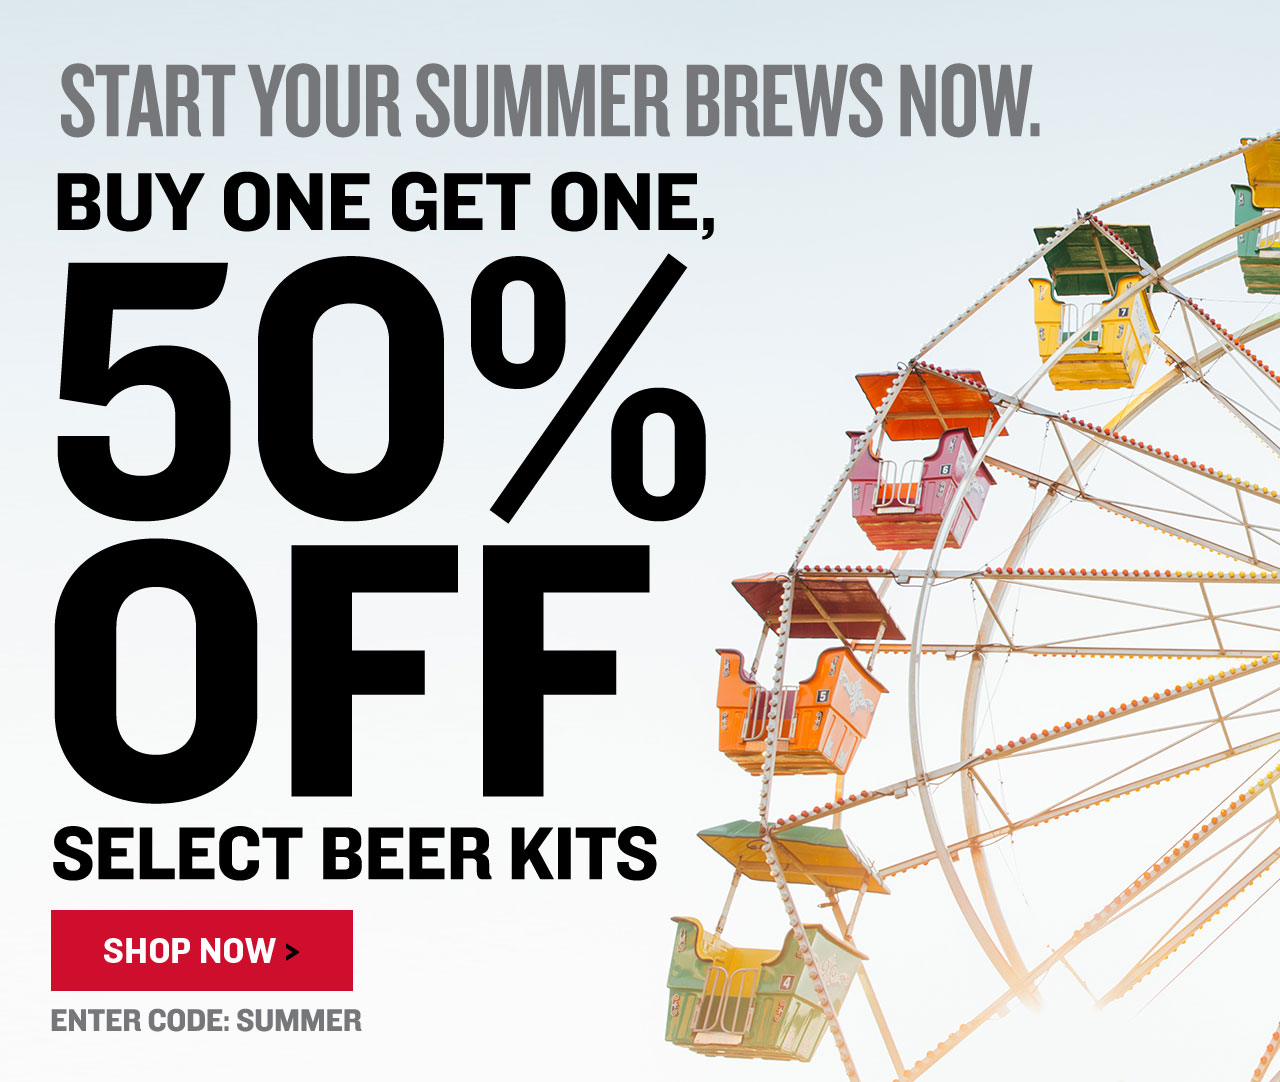 Buy one beer recipe kit, get one 50% Off! Promo code: SUMMER